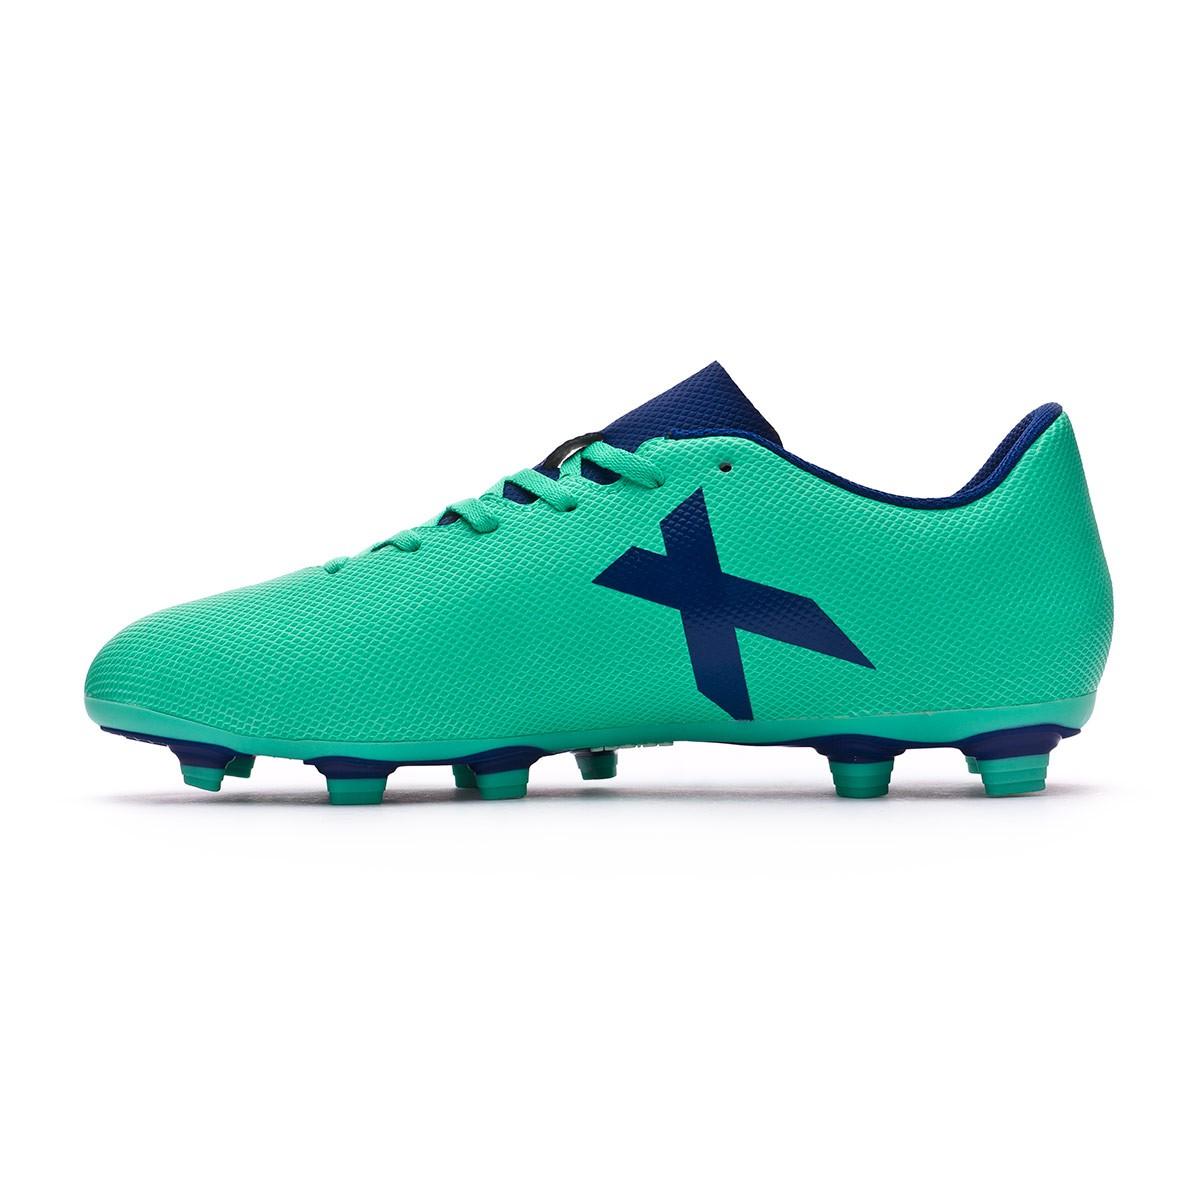 de97d7cd48026 Chuteira adidas X 17.4 FxG Aero green-Unity ink-Hi-res green - Loja de  futebol Fútbol Emotion